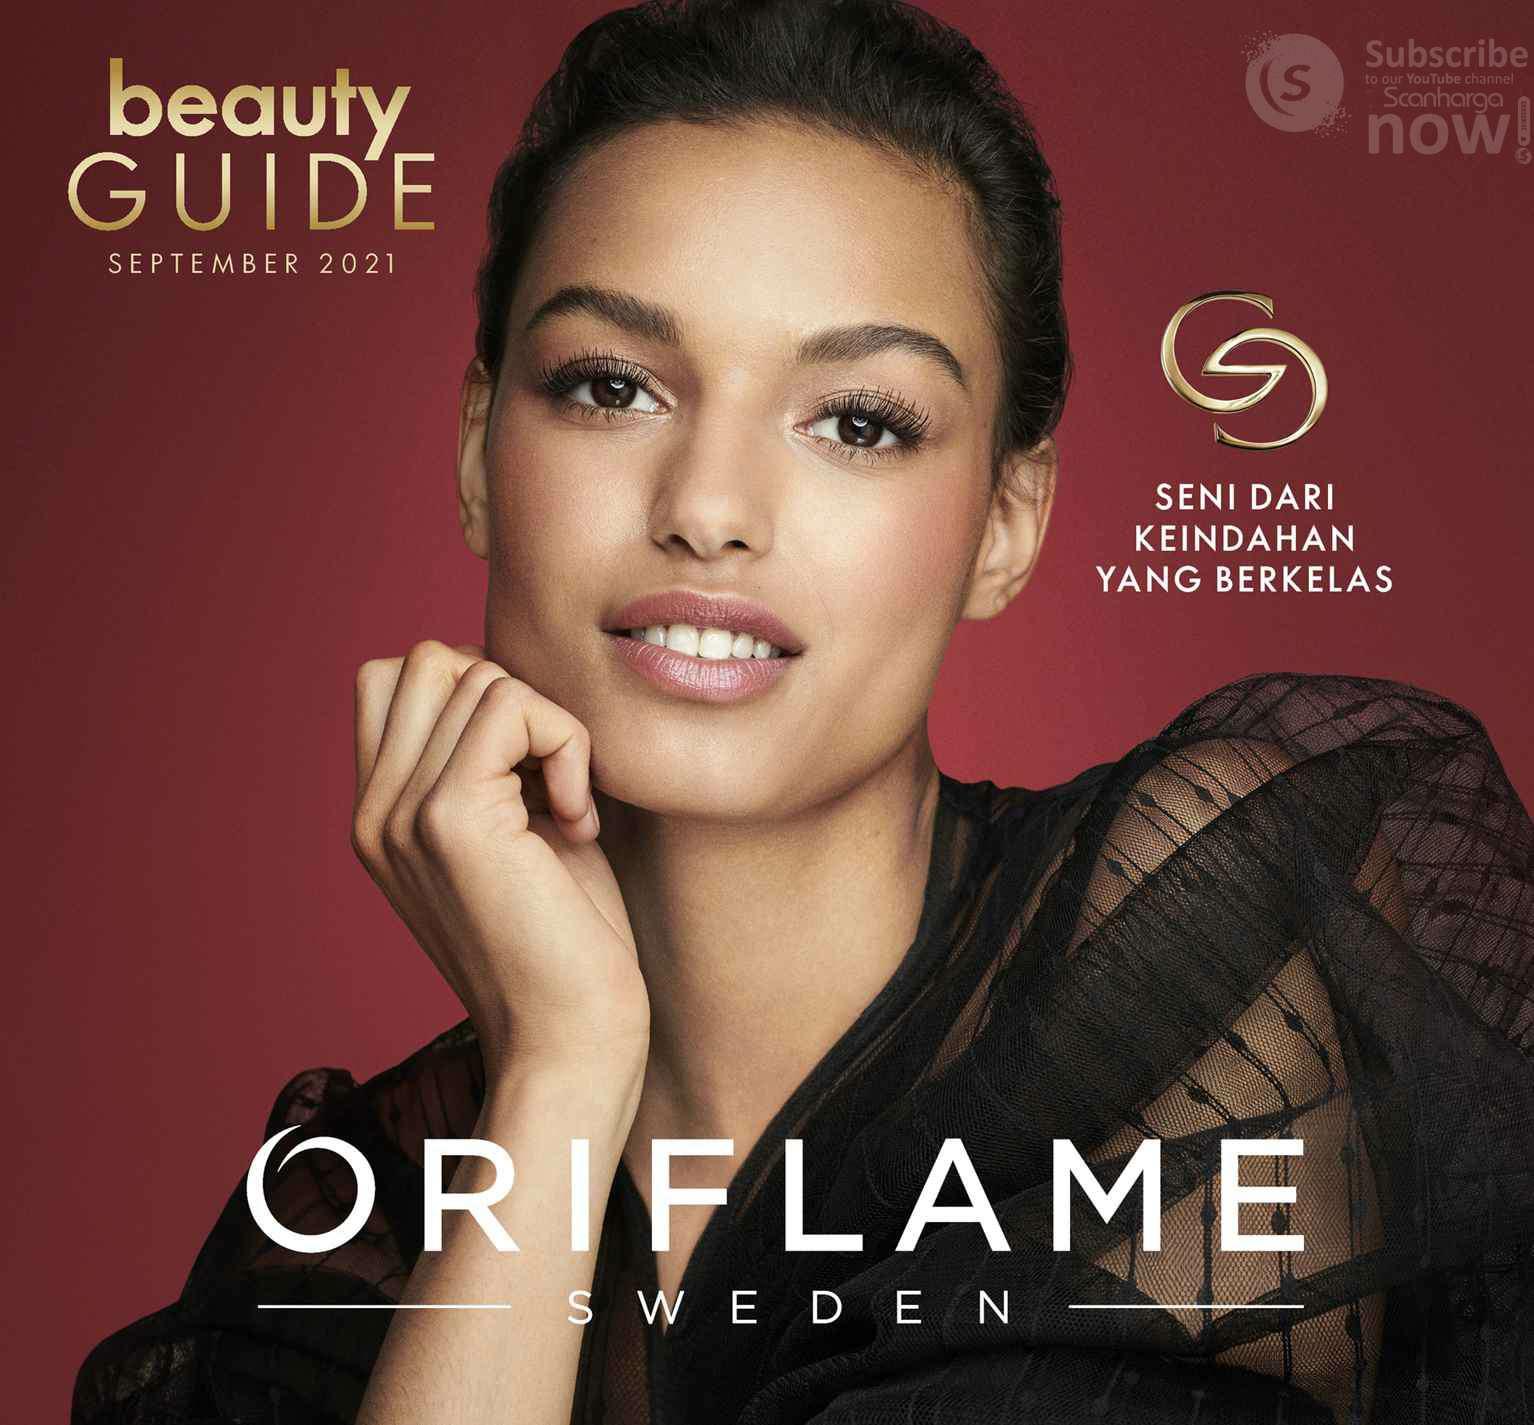 Katalog Oriflame September 2021